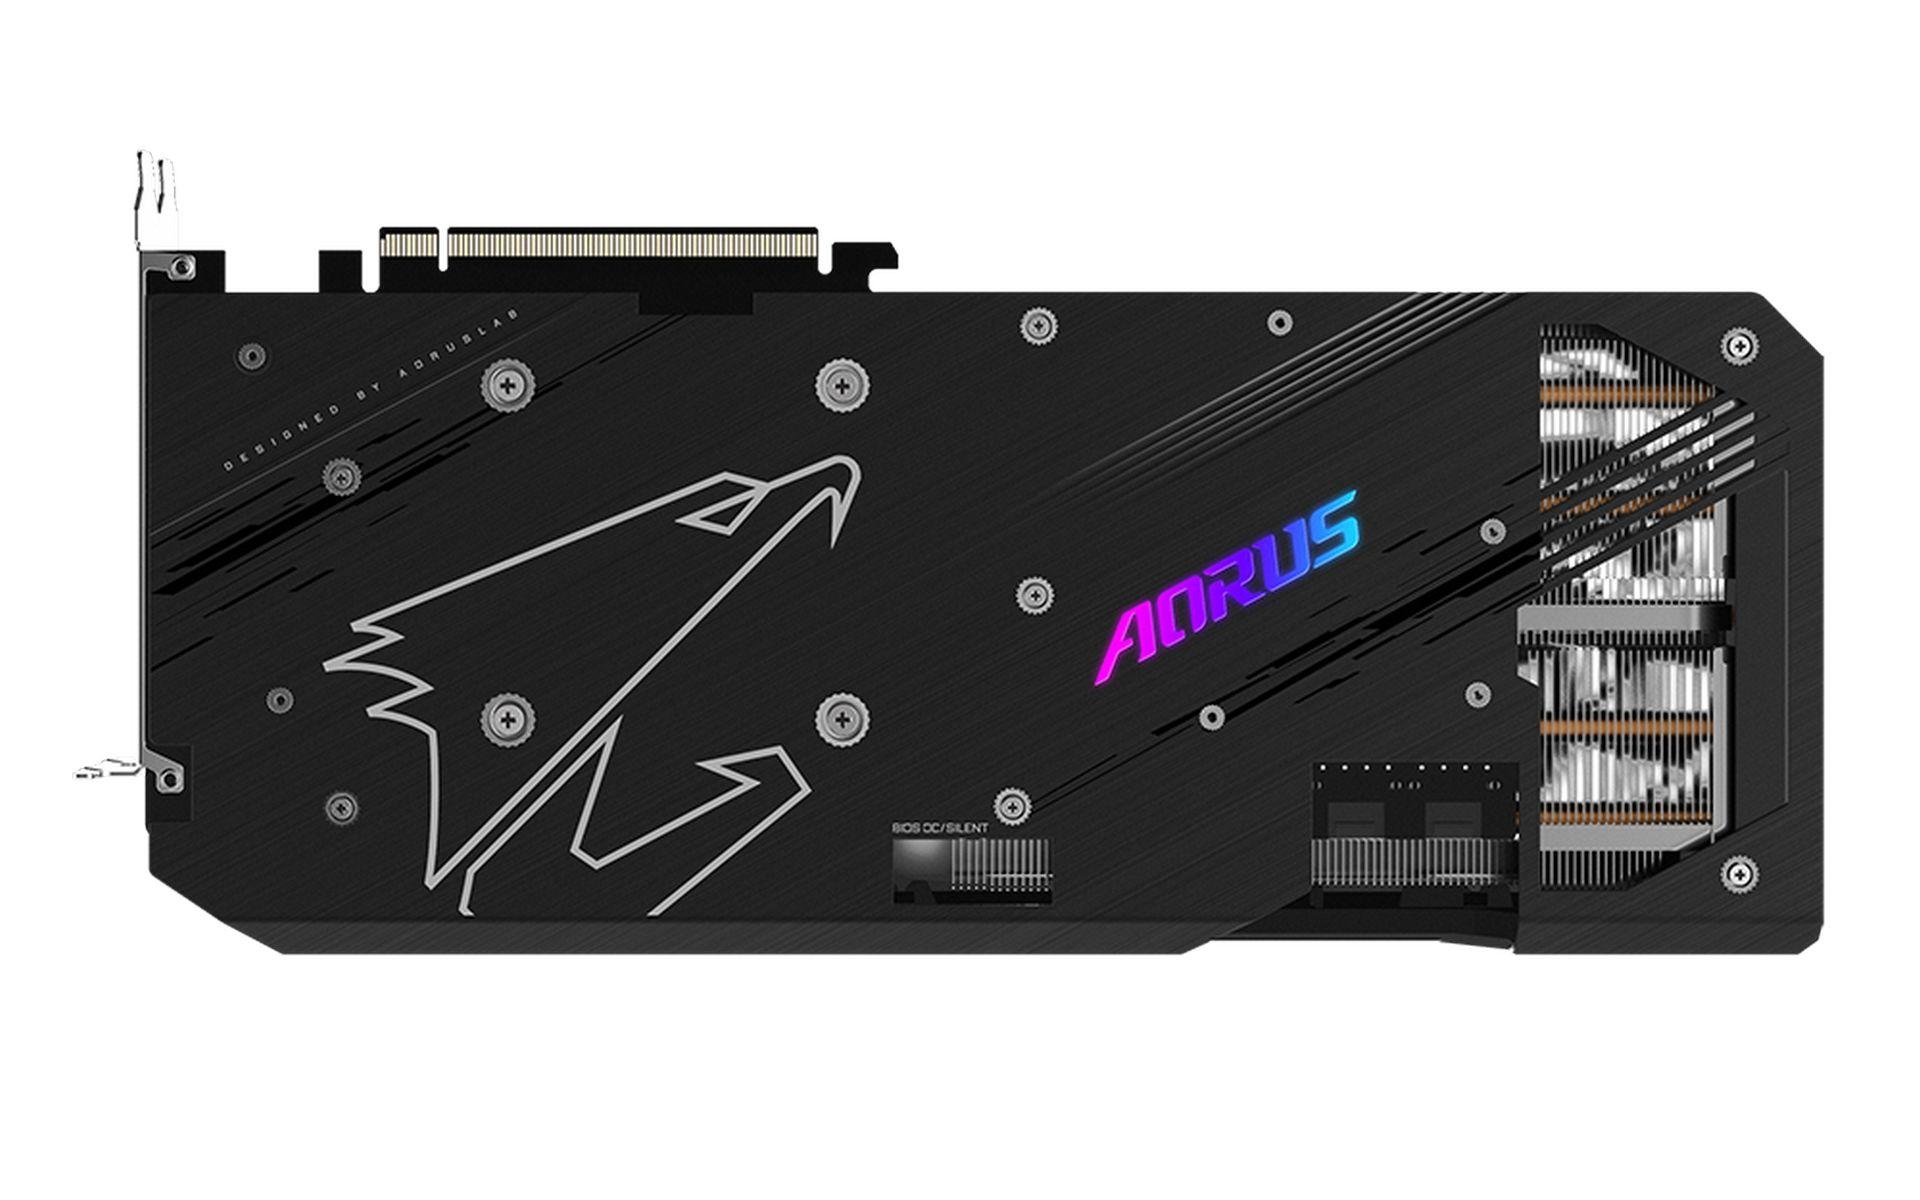 TẤM ỐP LƯNG KIM LOẠI RX 6800 XT AORUS MASTER